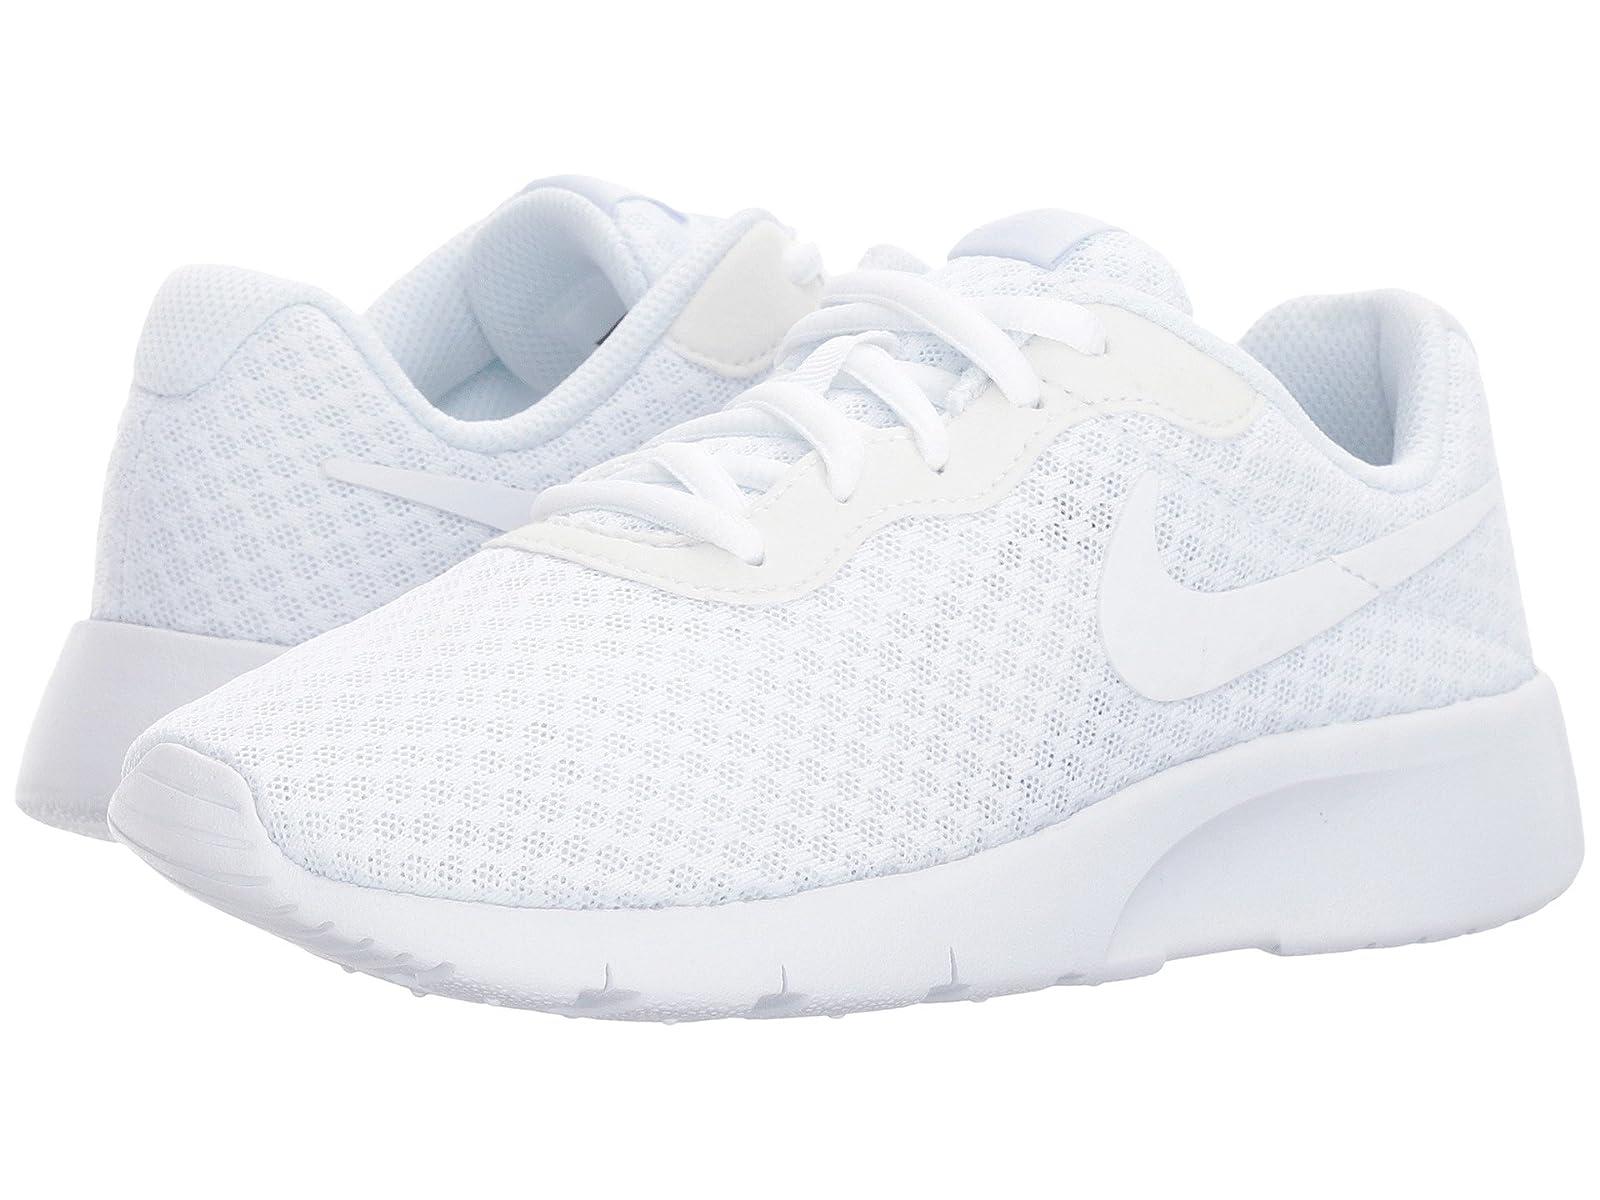 Nike Kids Tanjun (Little Kid)Atmospheric grades have affordable shoes